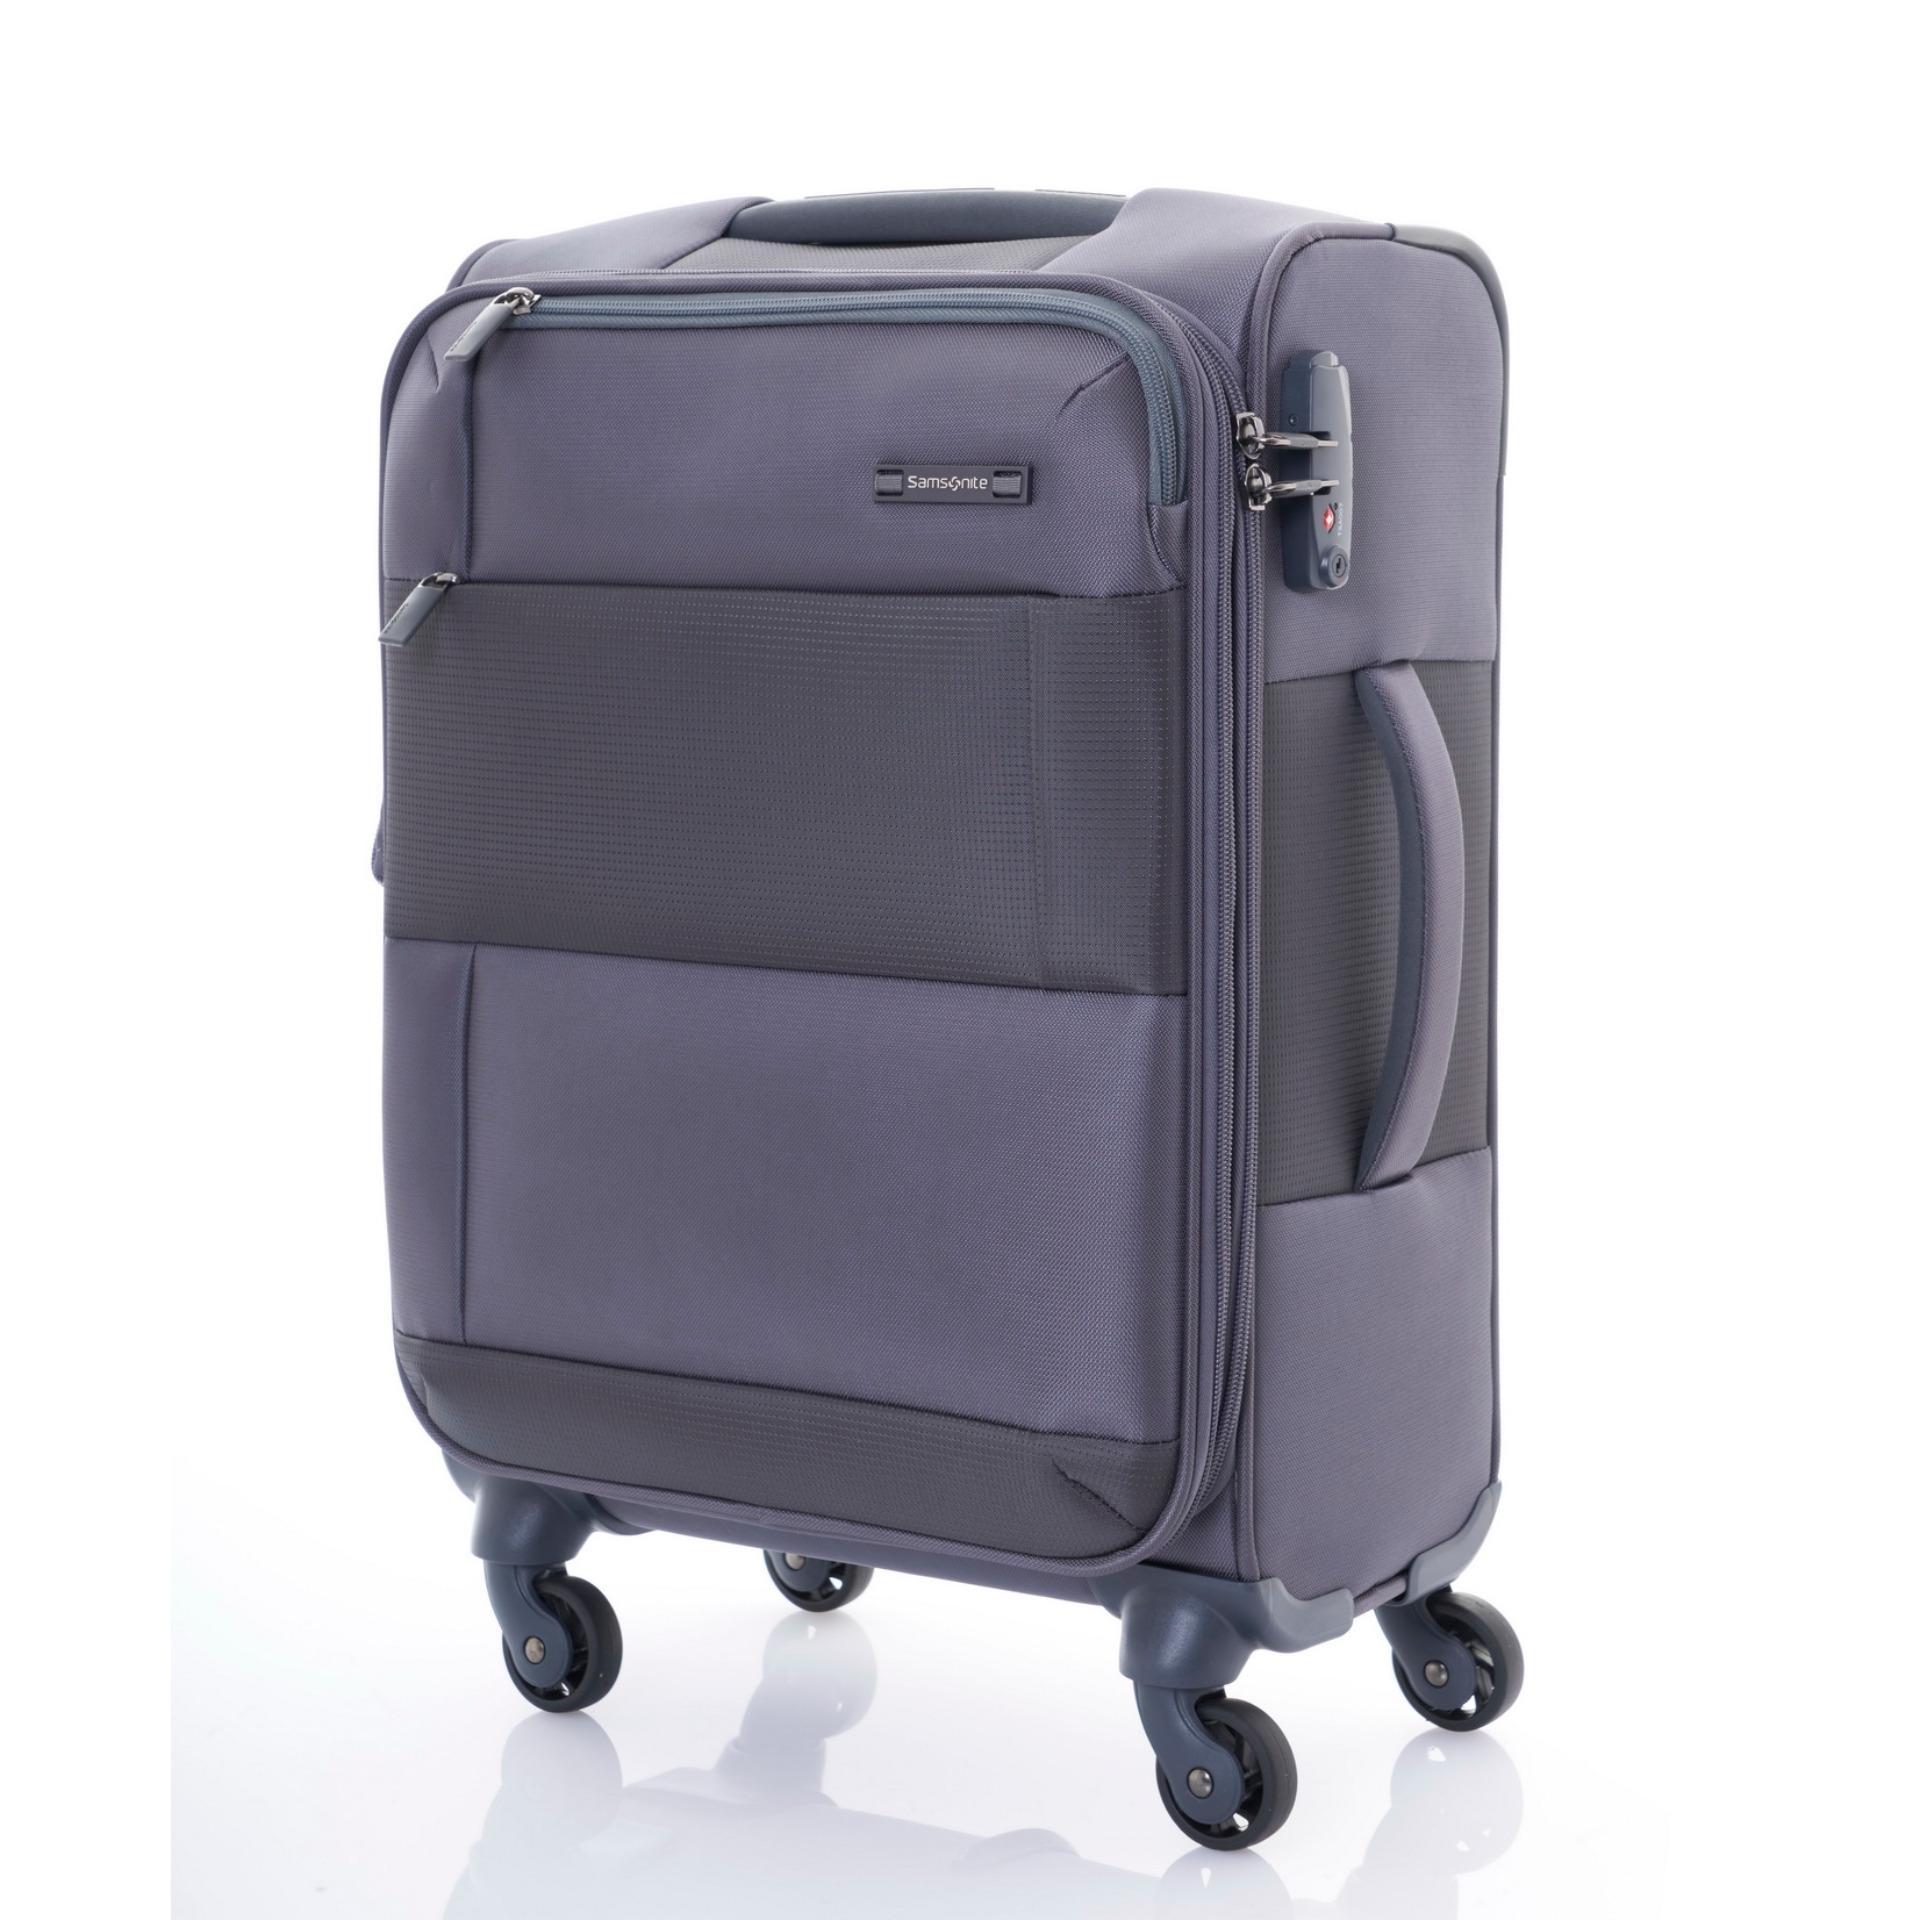 Real Polo Tas Koper Softcase Set Expandable 4 Roda 581 20 24 Hitam Passport 10121854 Gratis Pengiriman Area Jabodetabek Lazada Indonesia Source